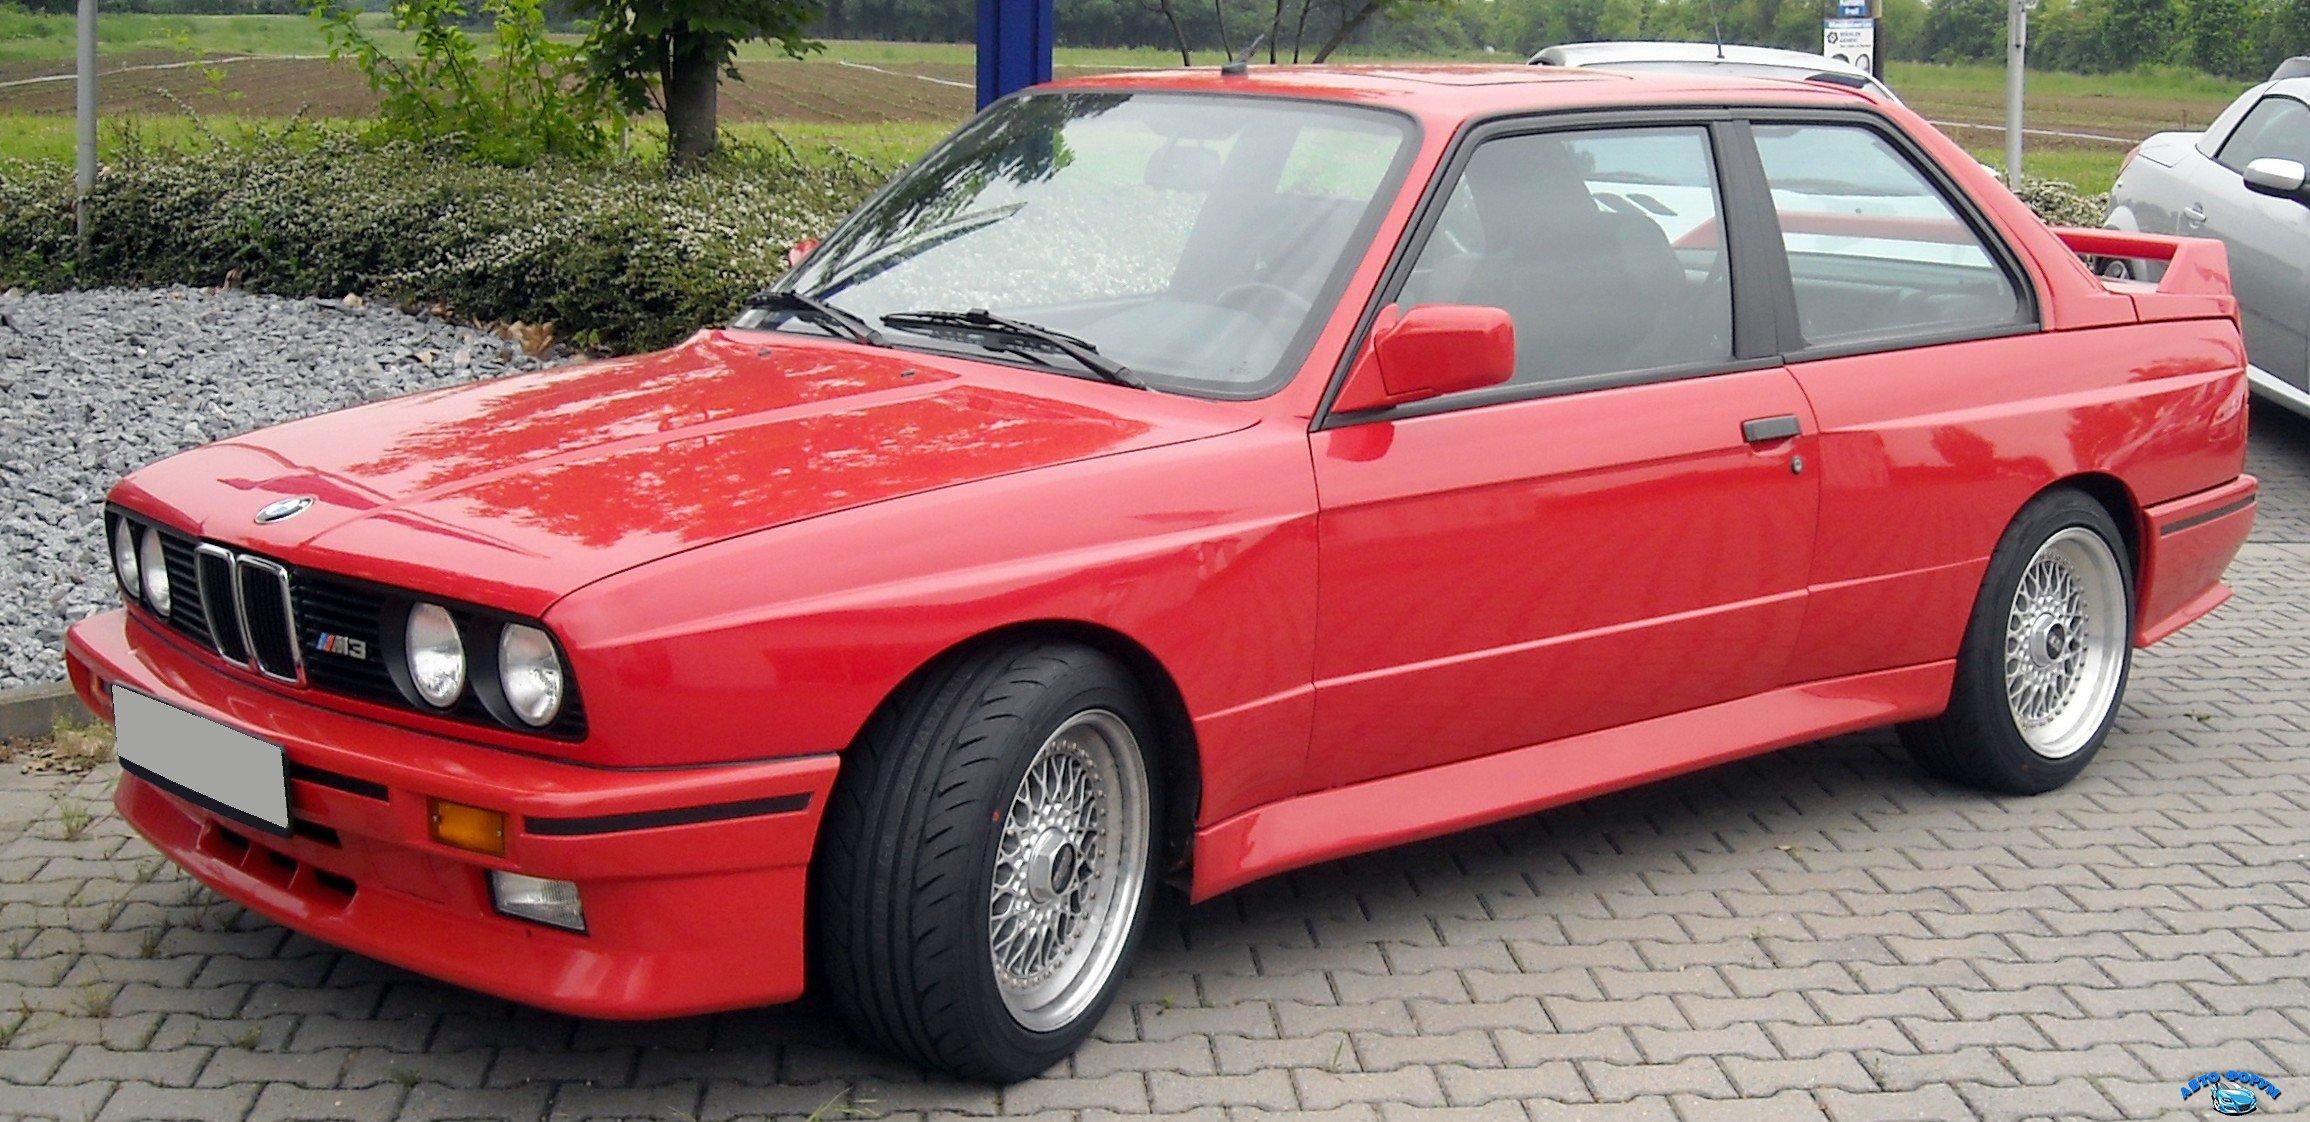 BMW_M3_E30_front_20090514.jpg